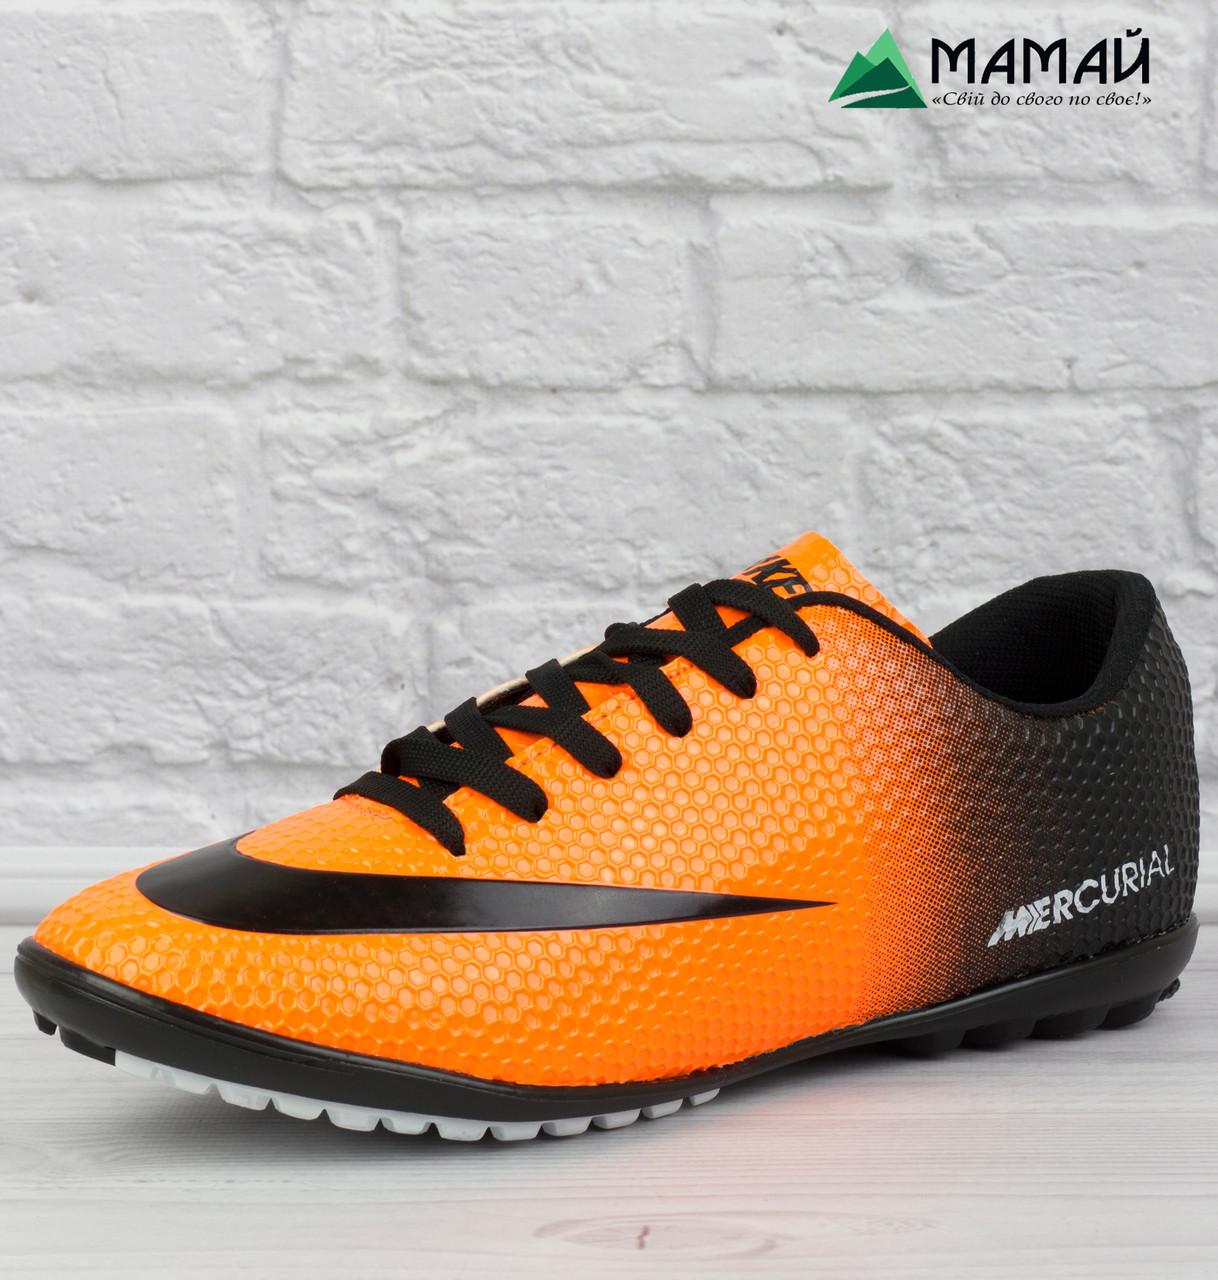 Футзалки Nike Mercurial бампи репліка 41р